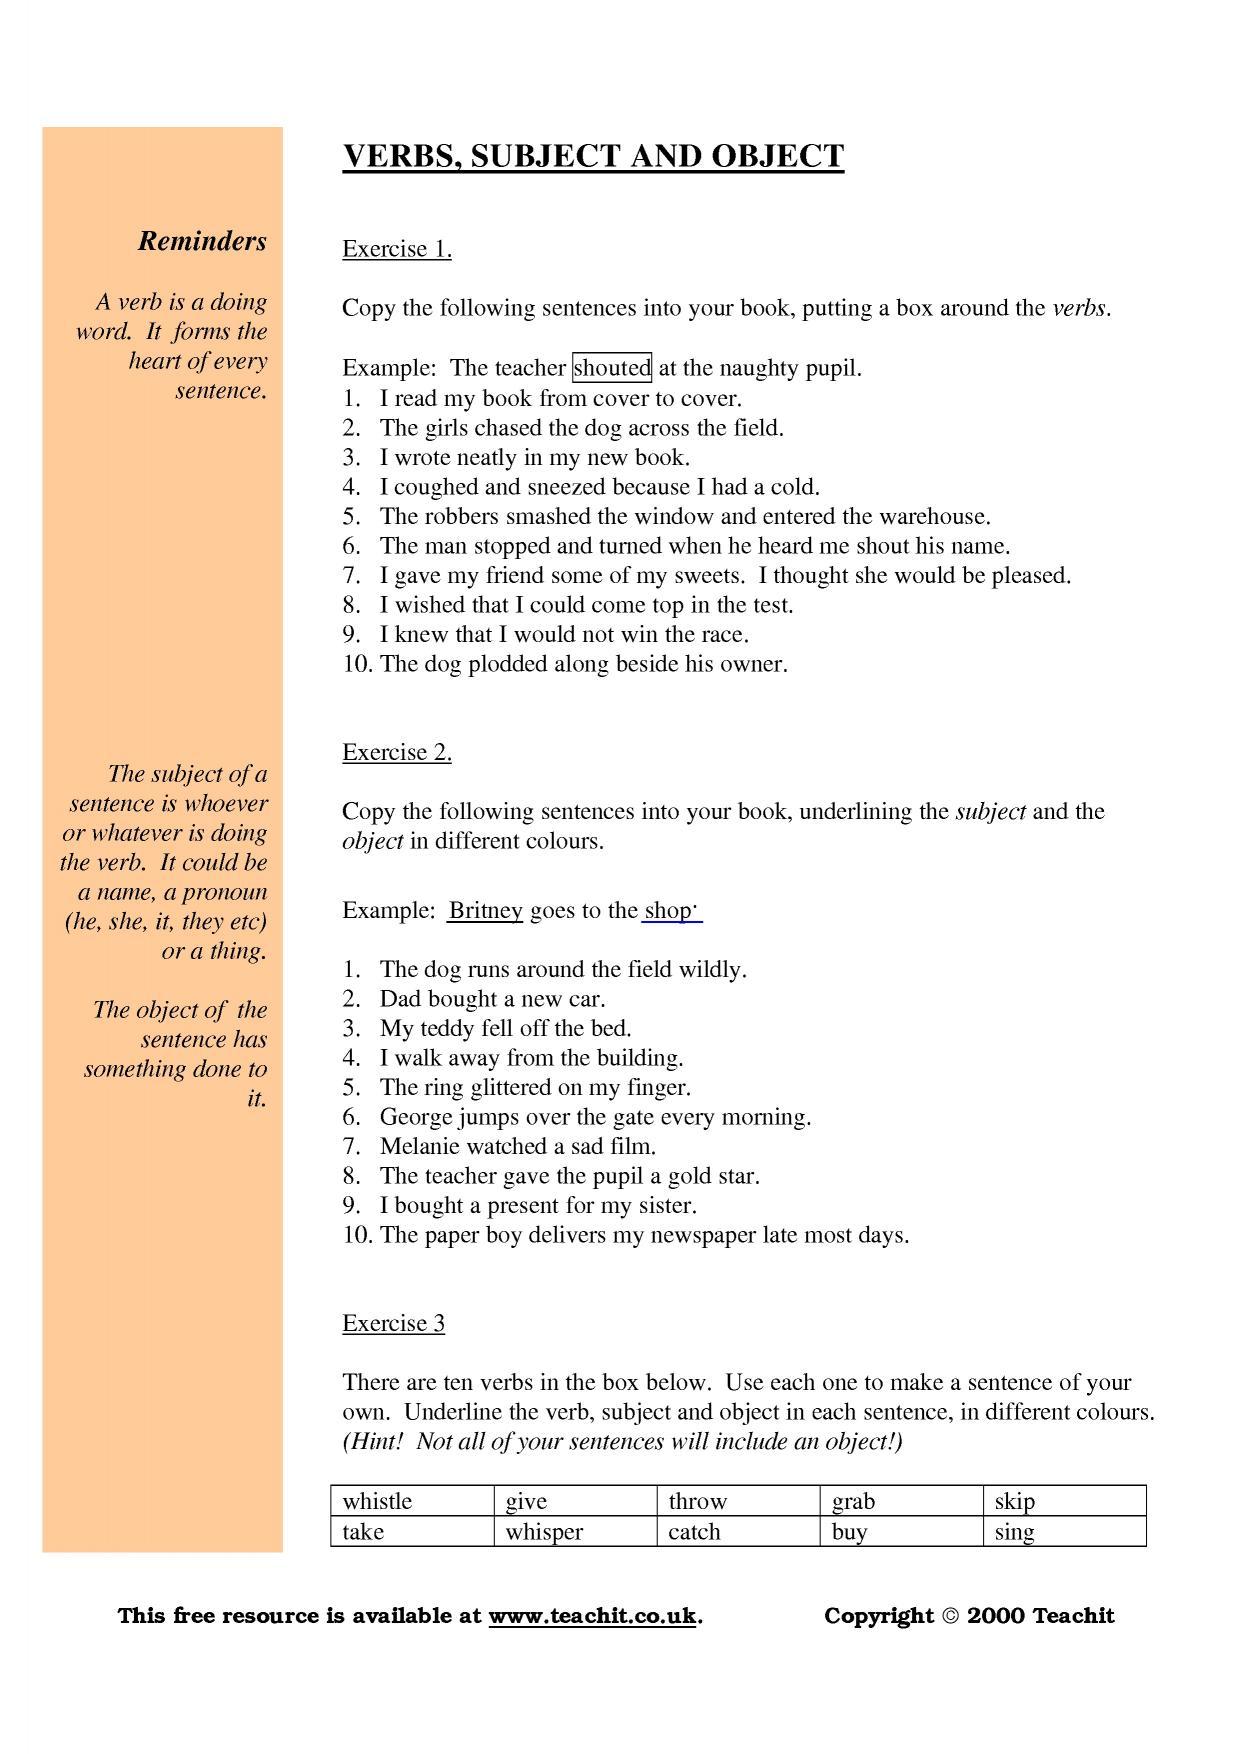 KS3 Grammar and vocabulary | Sentence construction | Teachit English